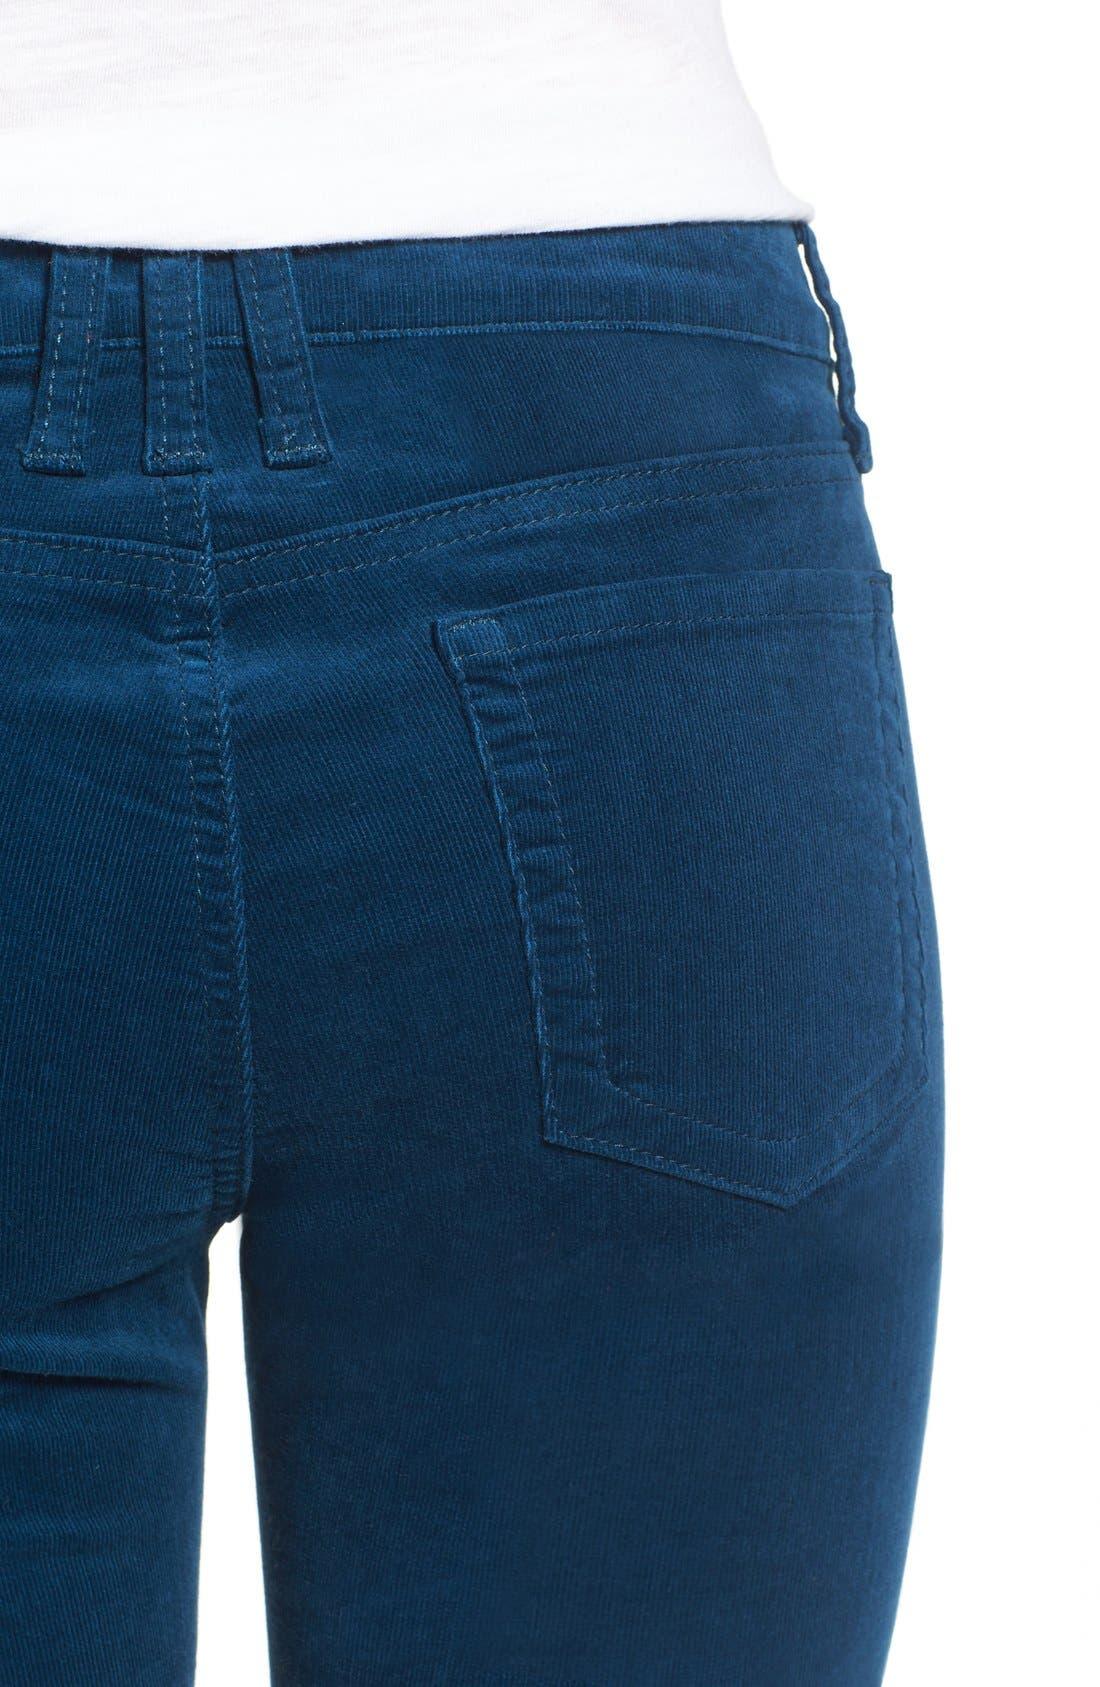 'Diana' Stretch Corduroy Skinny Pants,                             Alternate thumbnail 193, color,